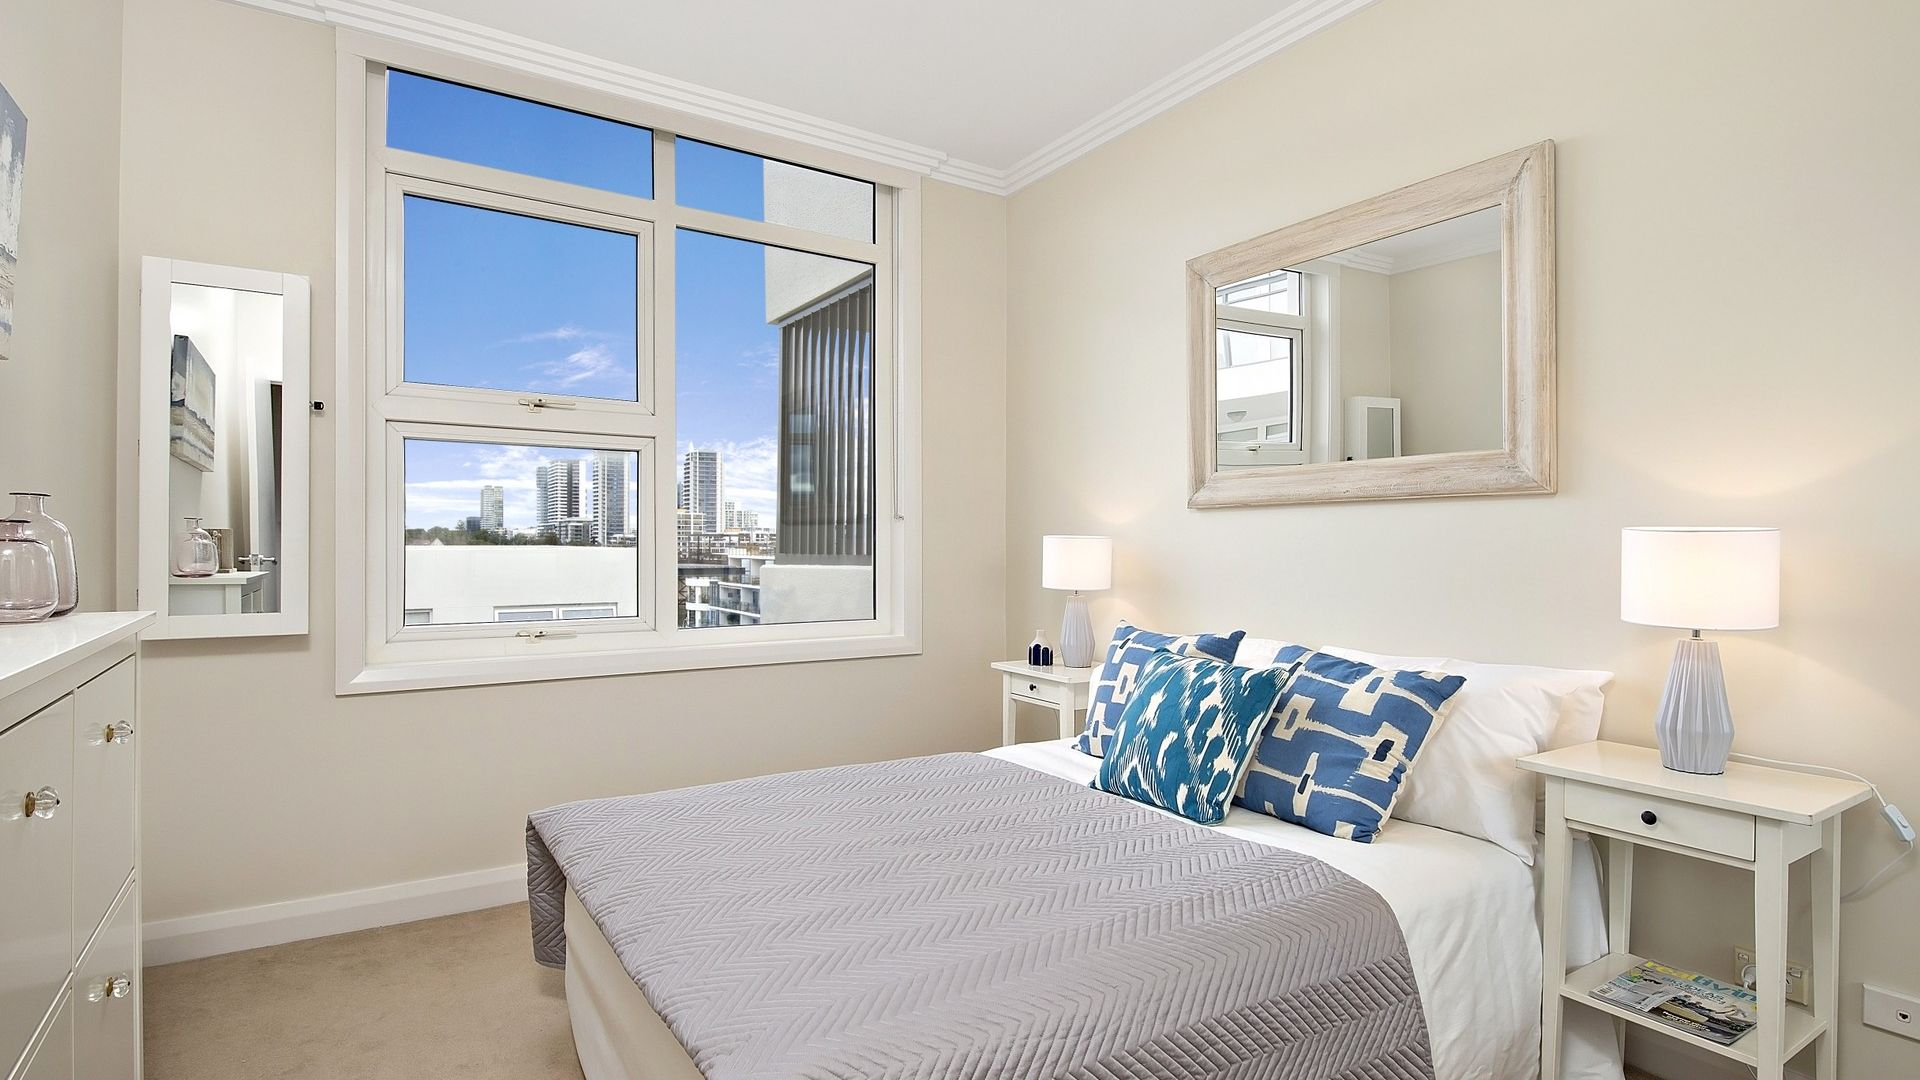 33/25 Angas Street, Meadowbank NSW 2114, Image 2